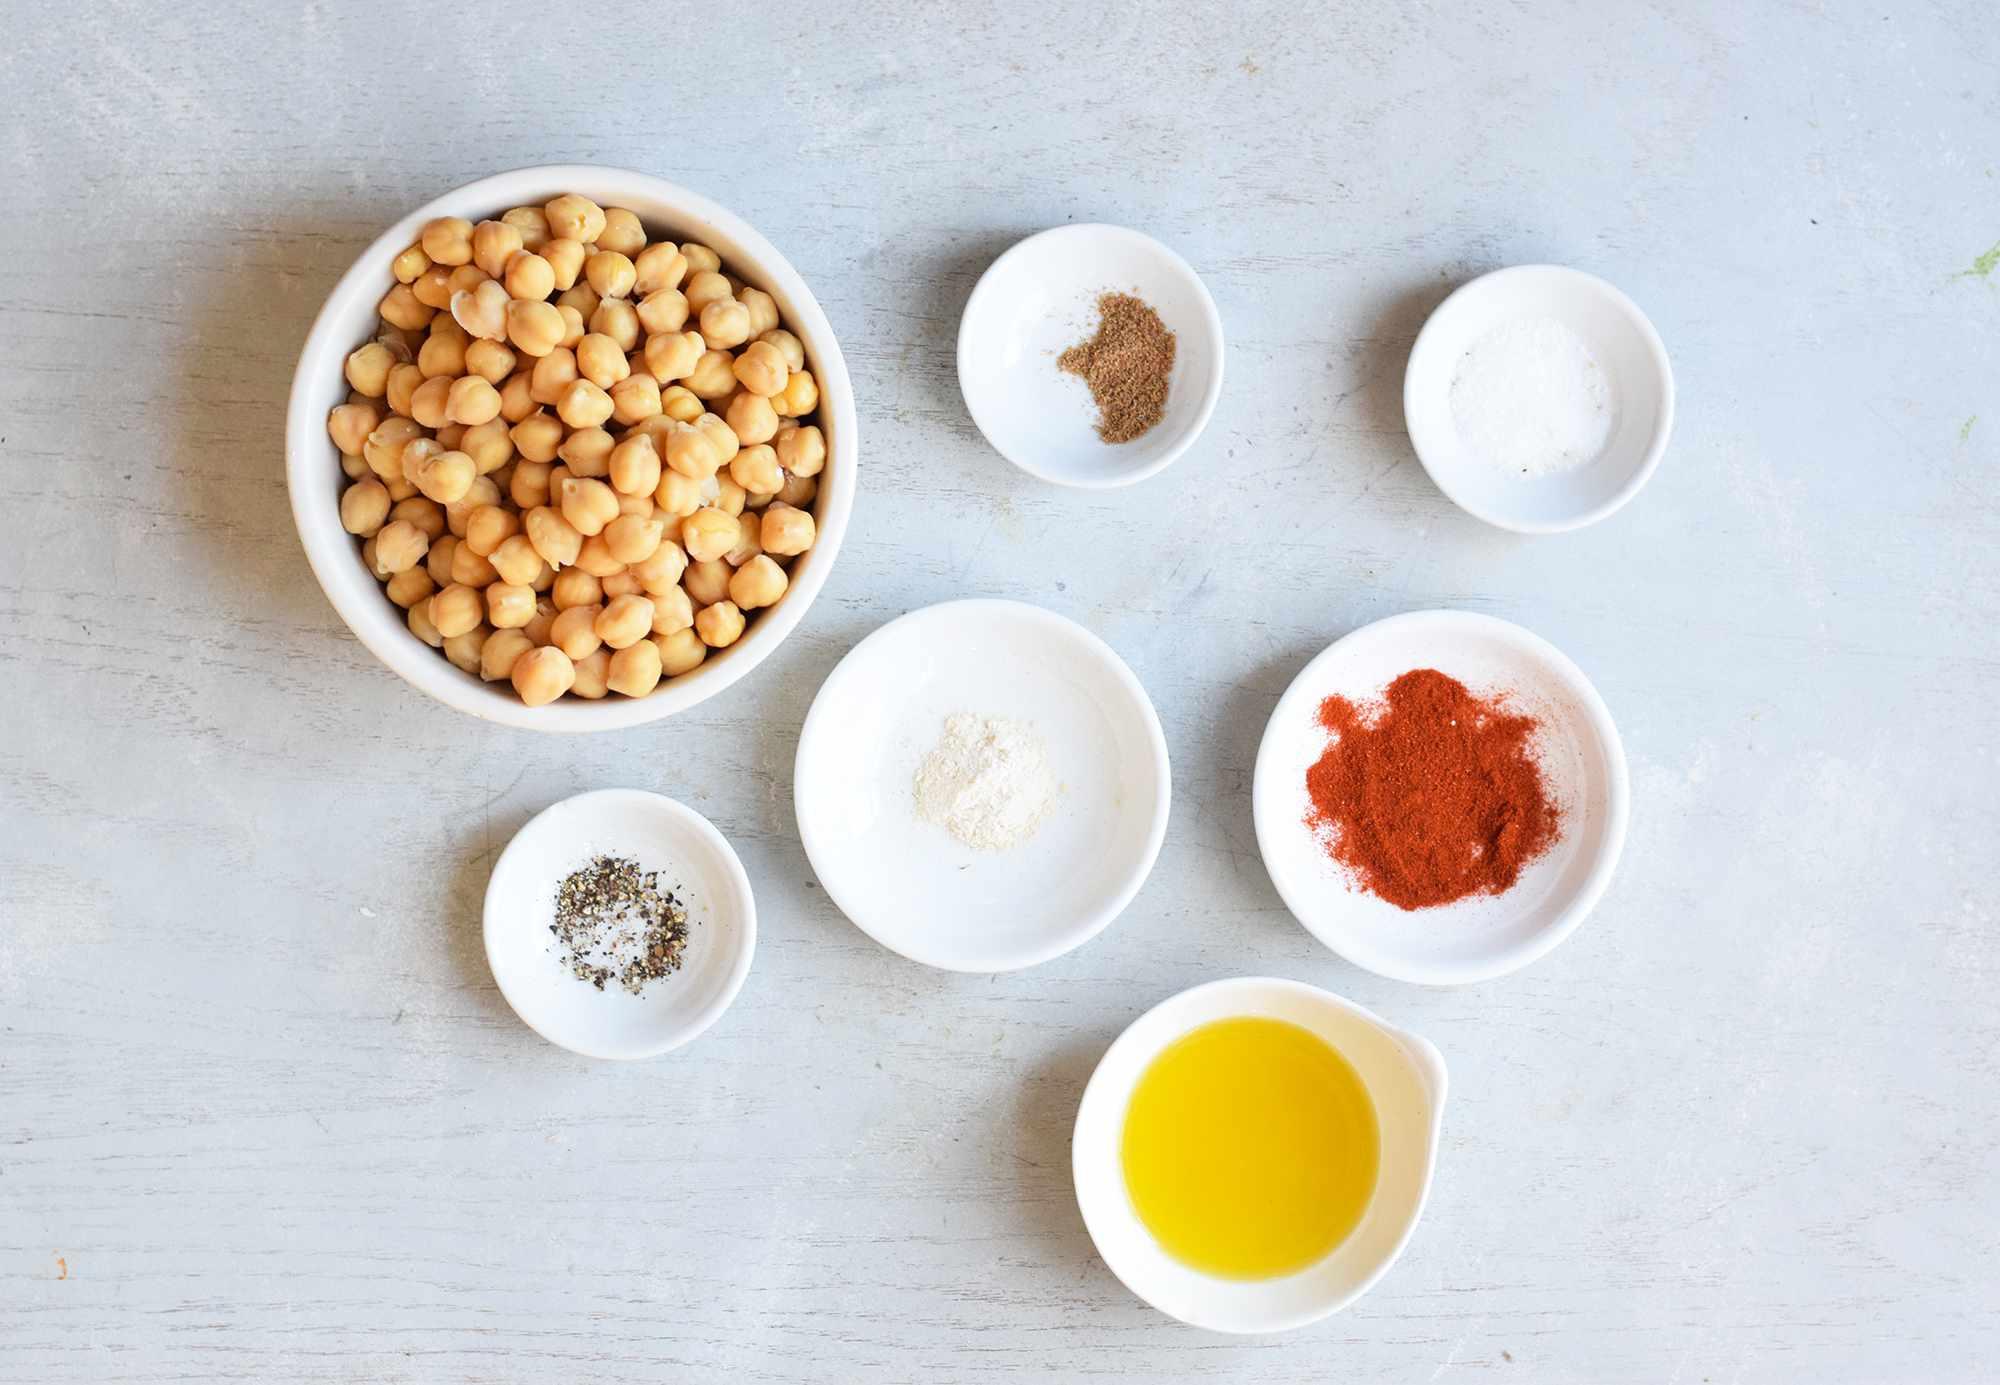 crispy-spiced-chickpeas-recipe-450291-01